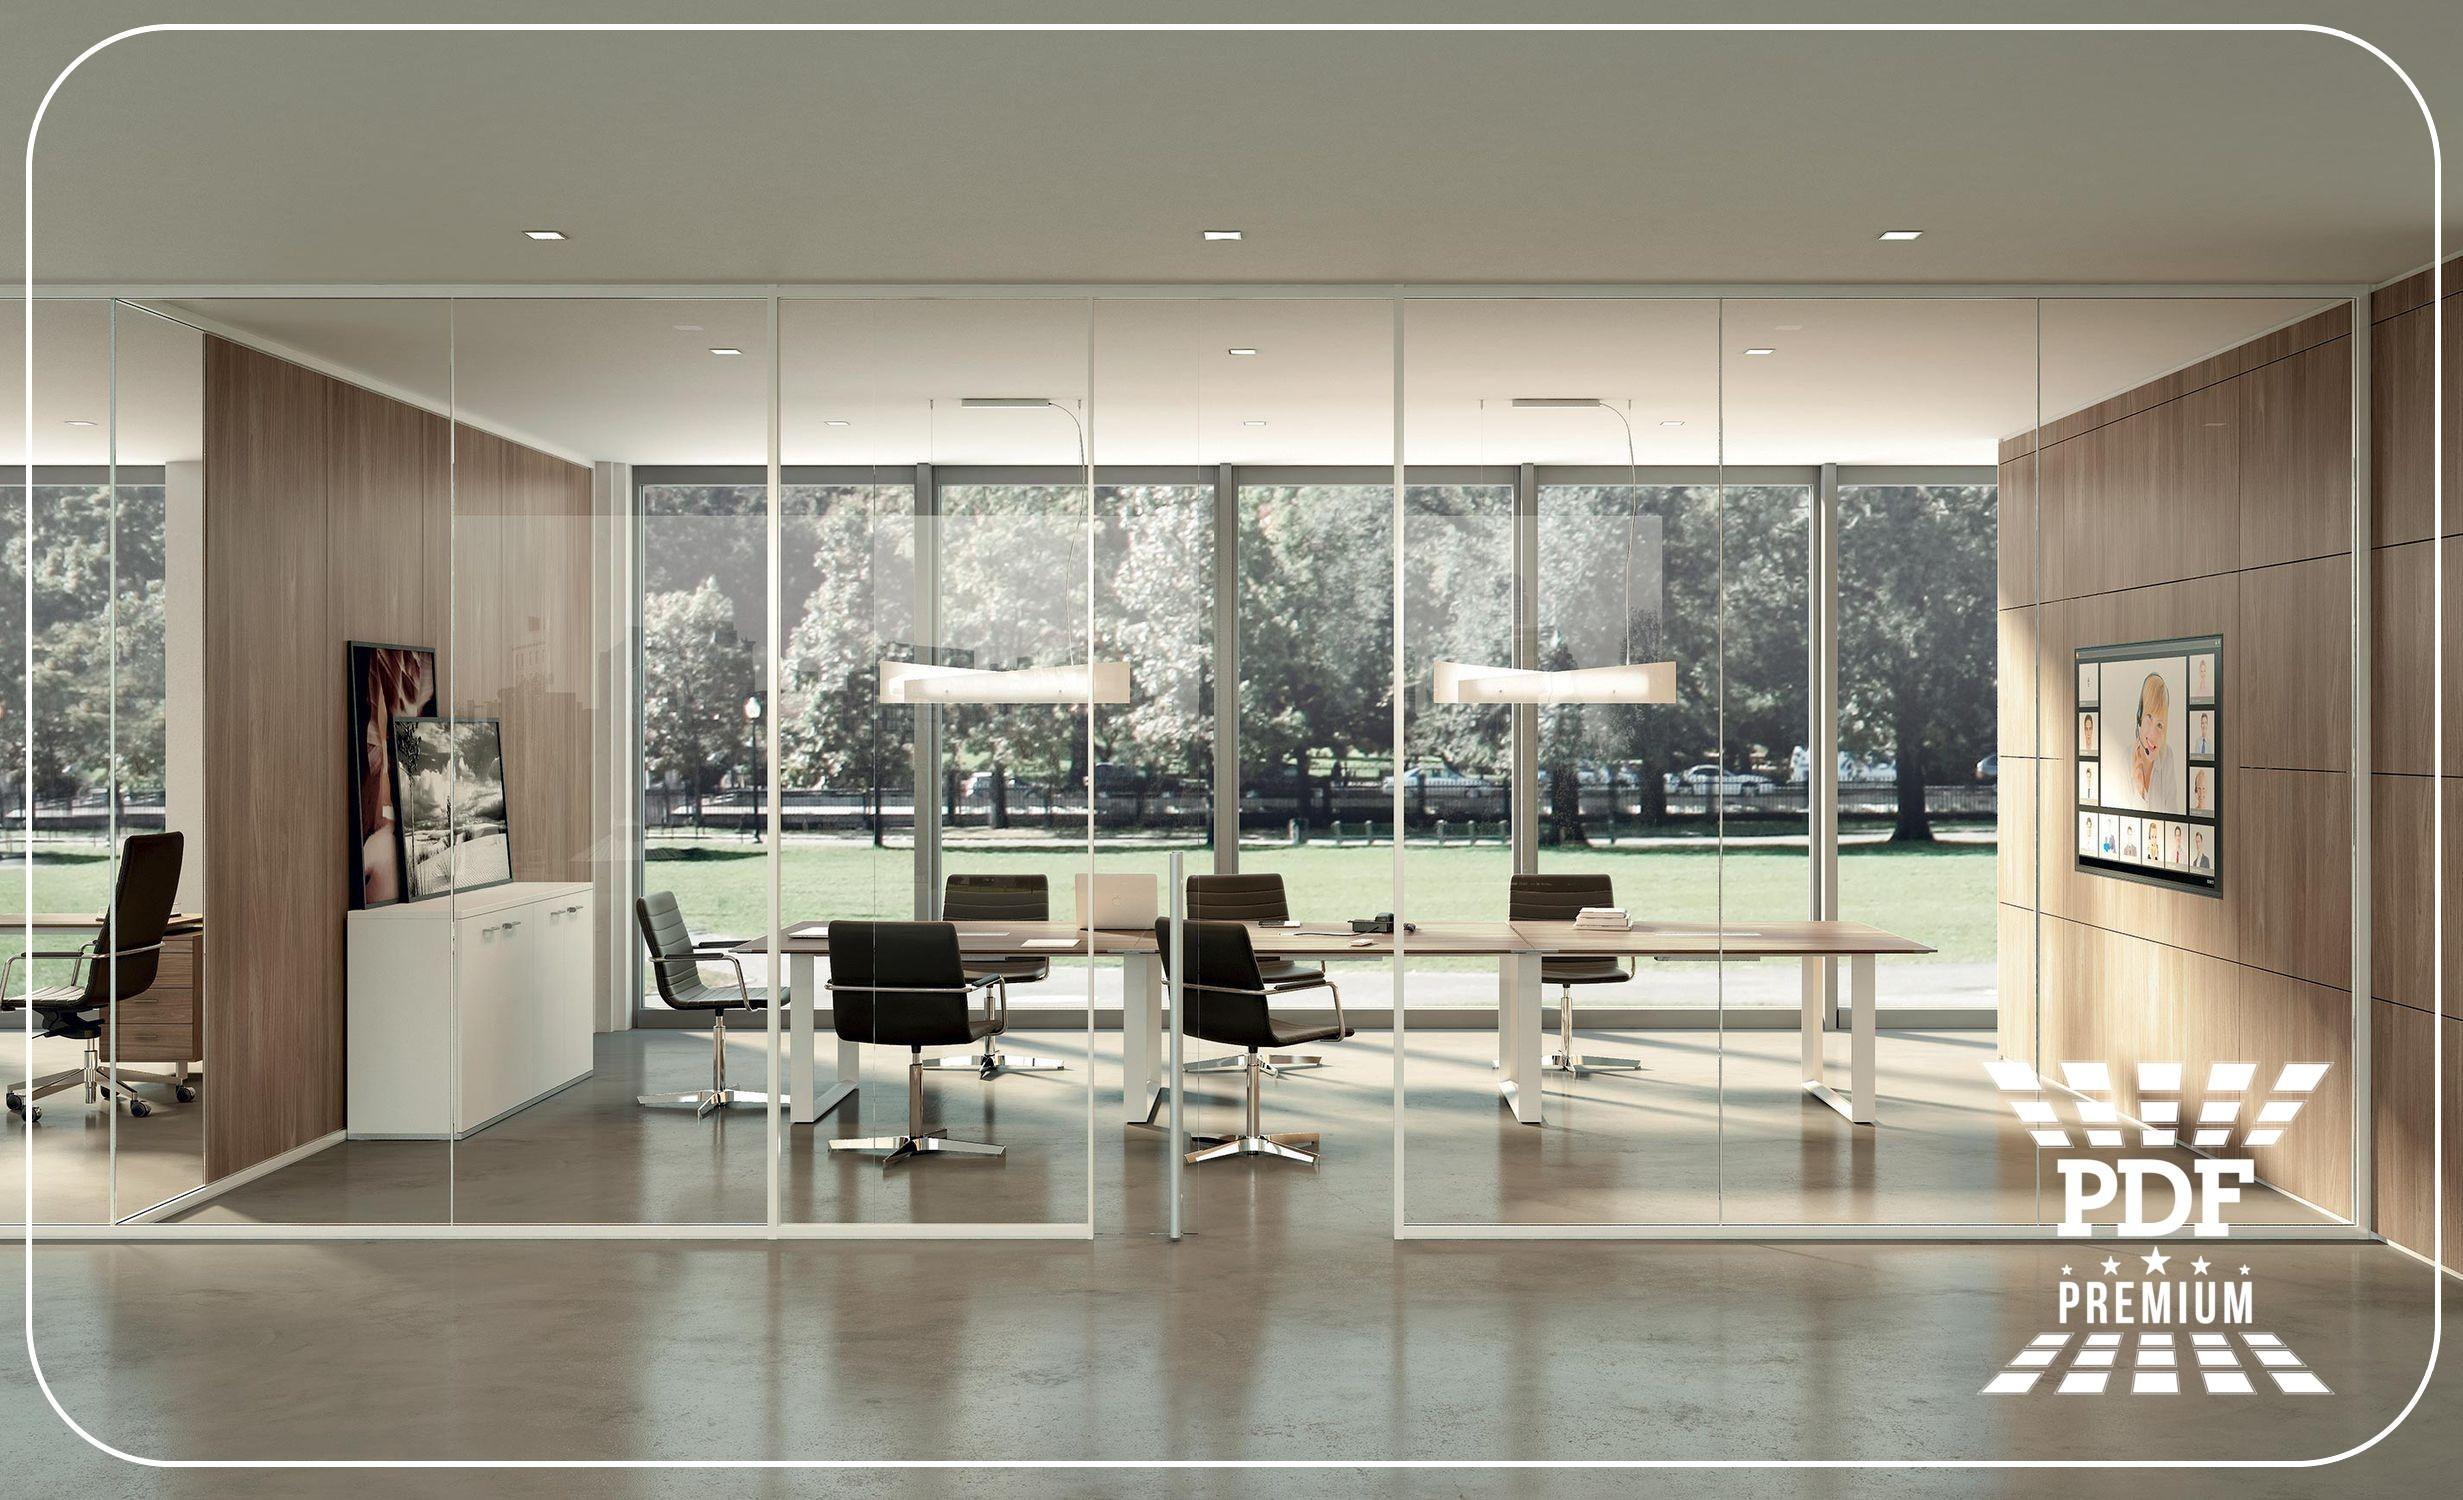 fornecedor-de-divisorias-de-vidro-piso-teto.jpg